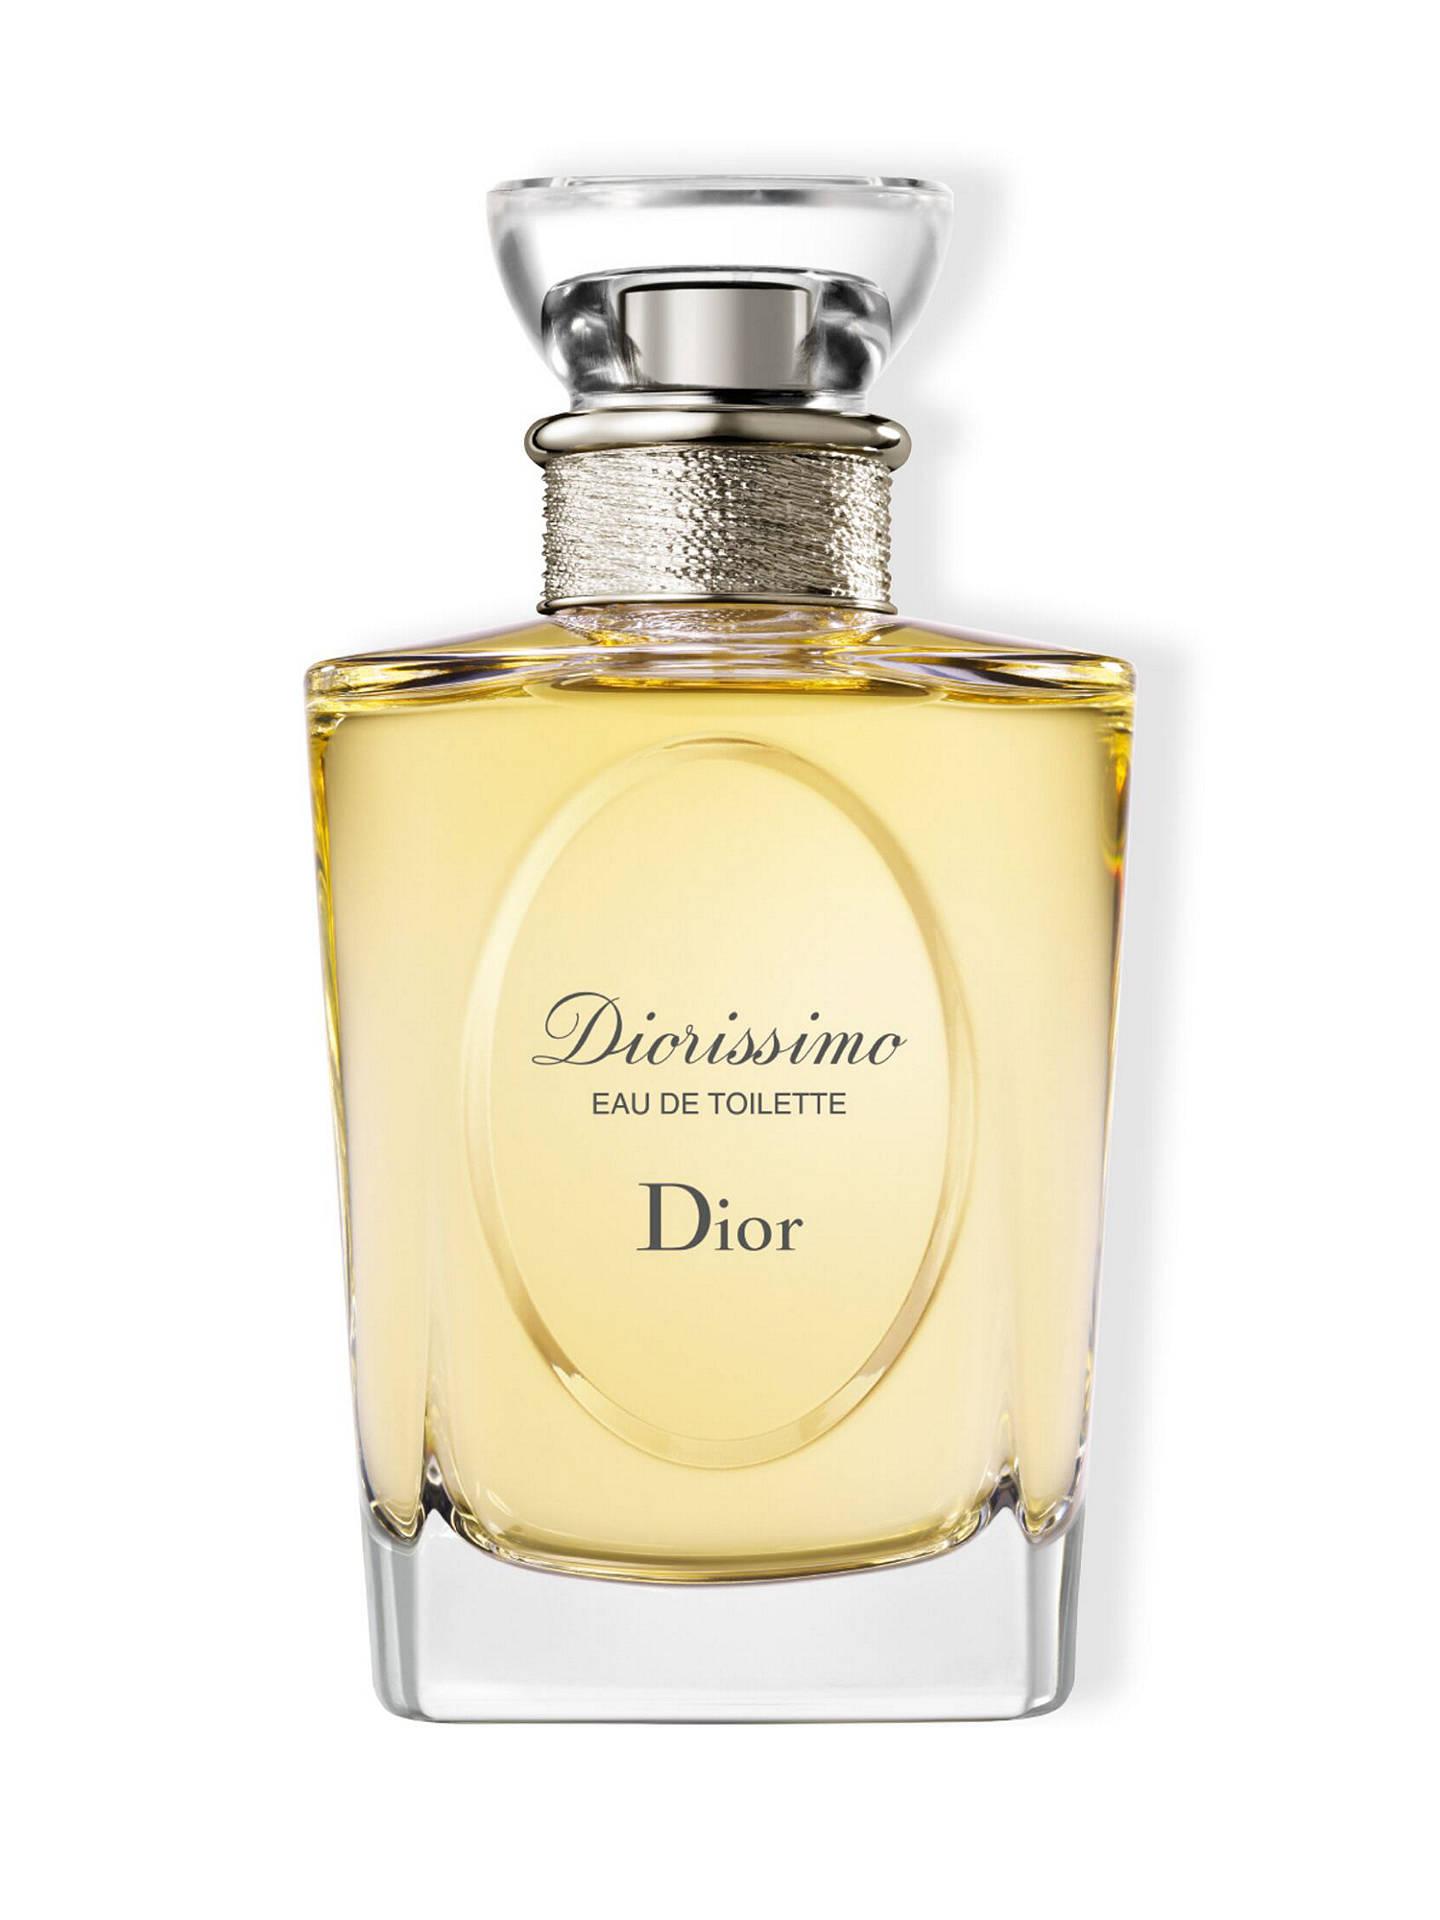 55e27249 Dior Diorissimo Eau De Toilette Spray at John Lewis & Partners